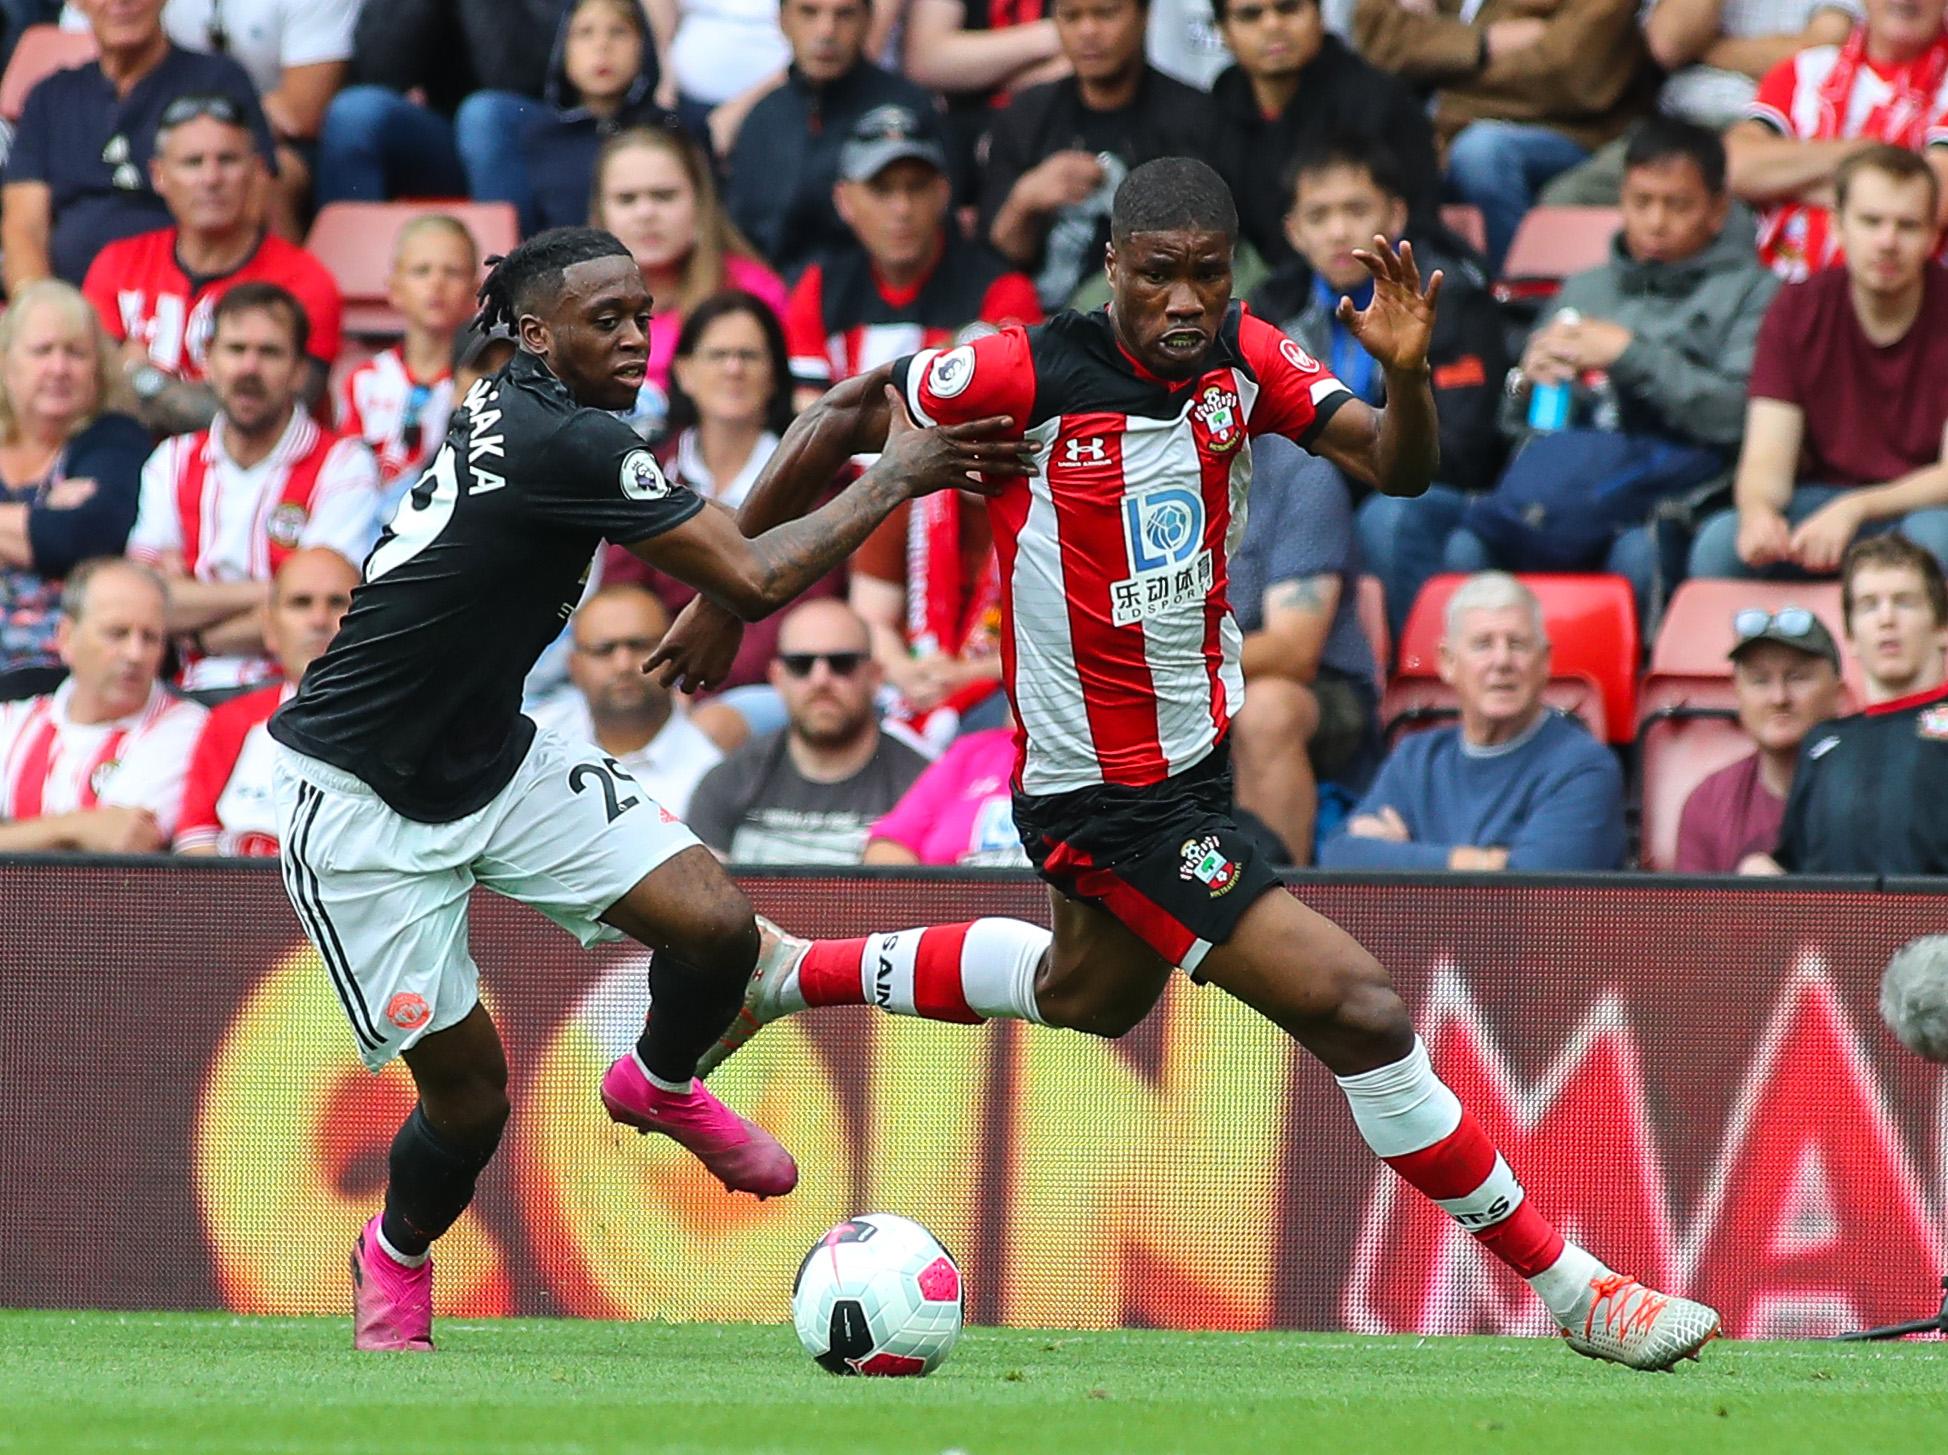 Southampton boss Ralph Hasenhuttl still has confidence in Kevin Danso